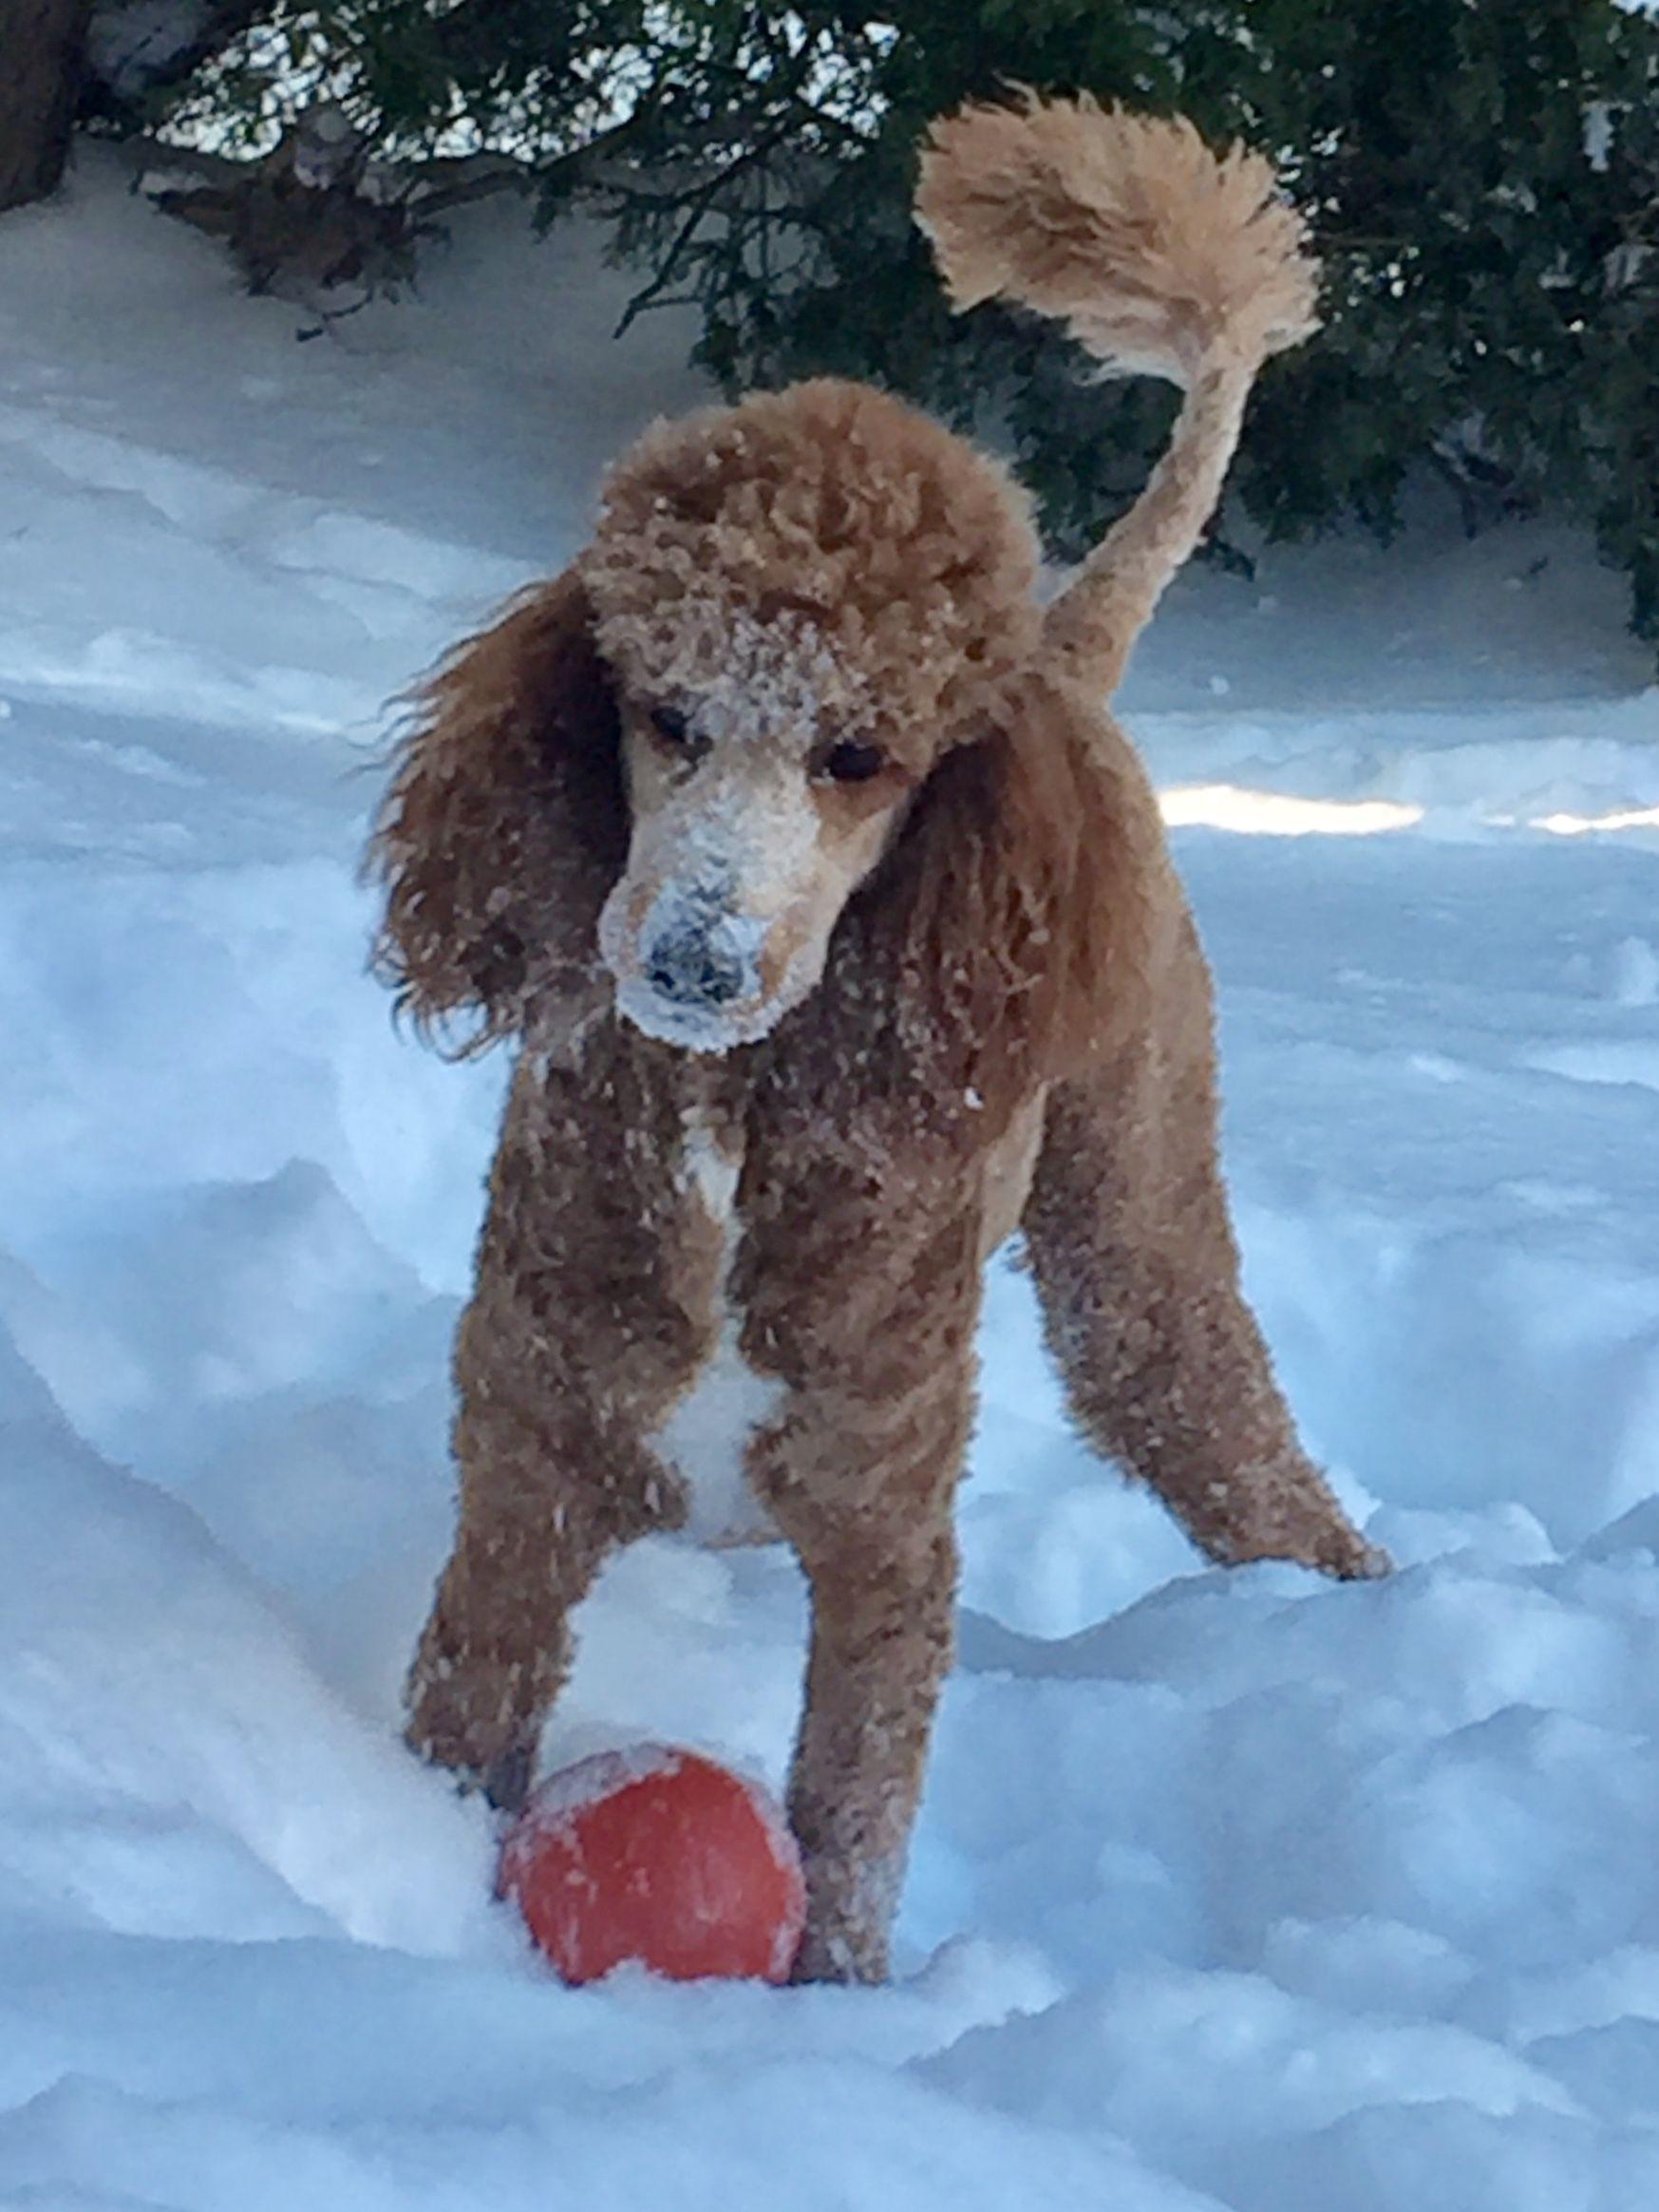 Standard Poodle Storm Loves Snow Poodle Dogs Puppies Pup